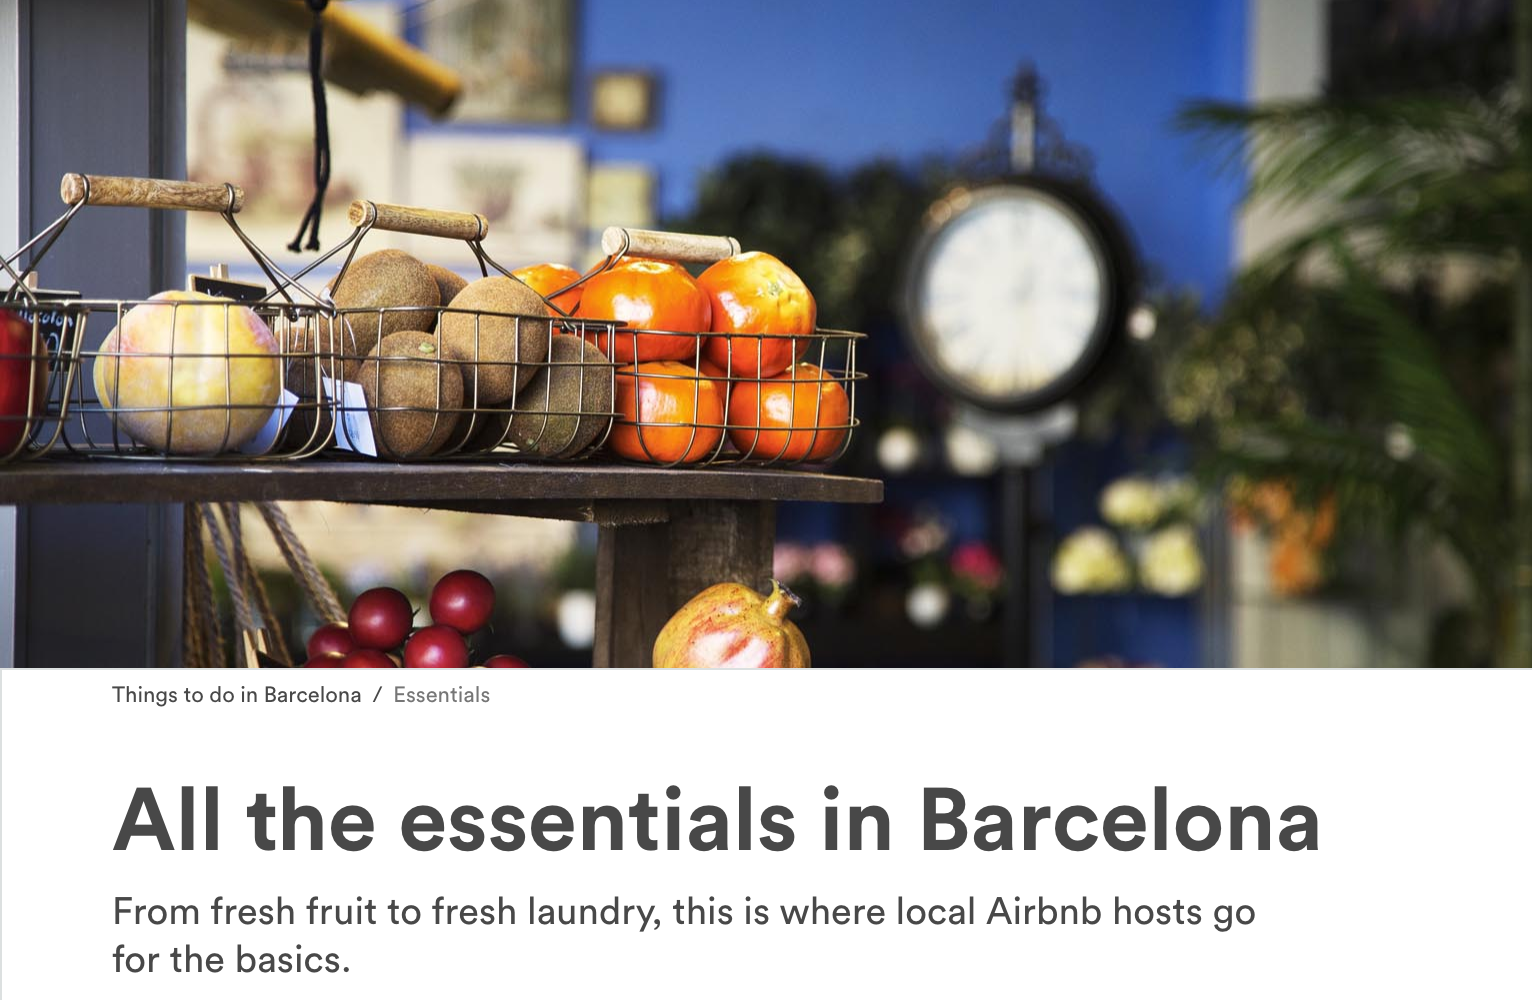 essentials-barcelona-mich-seixas